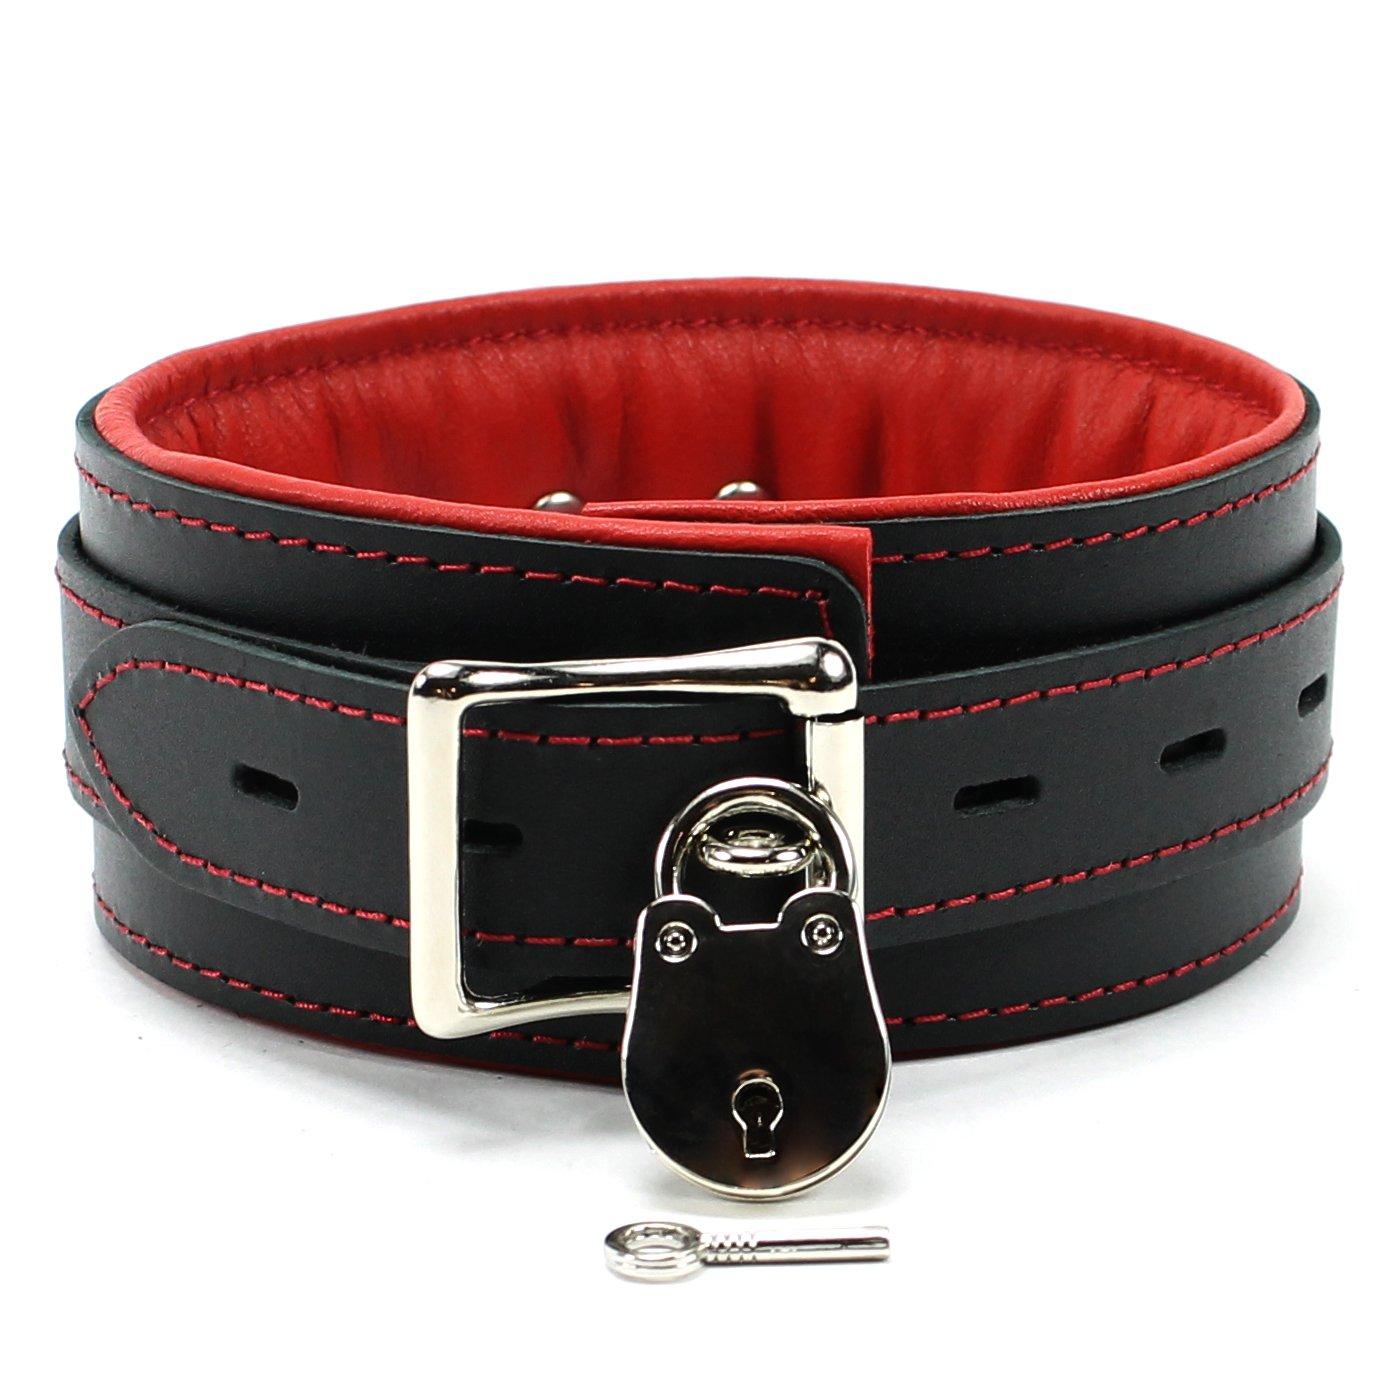 Mandrake Lockable Collar Premium Genuine Leather Sub Cosplay Neck Choker Handmade In USA (Red)